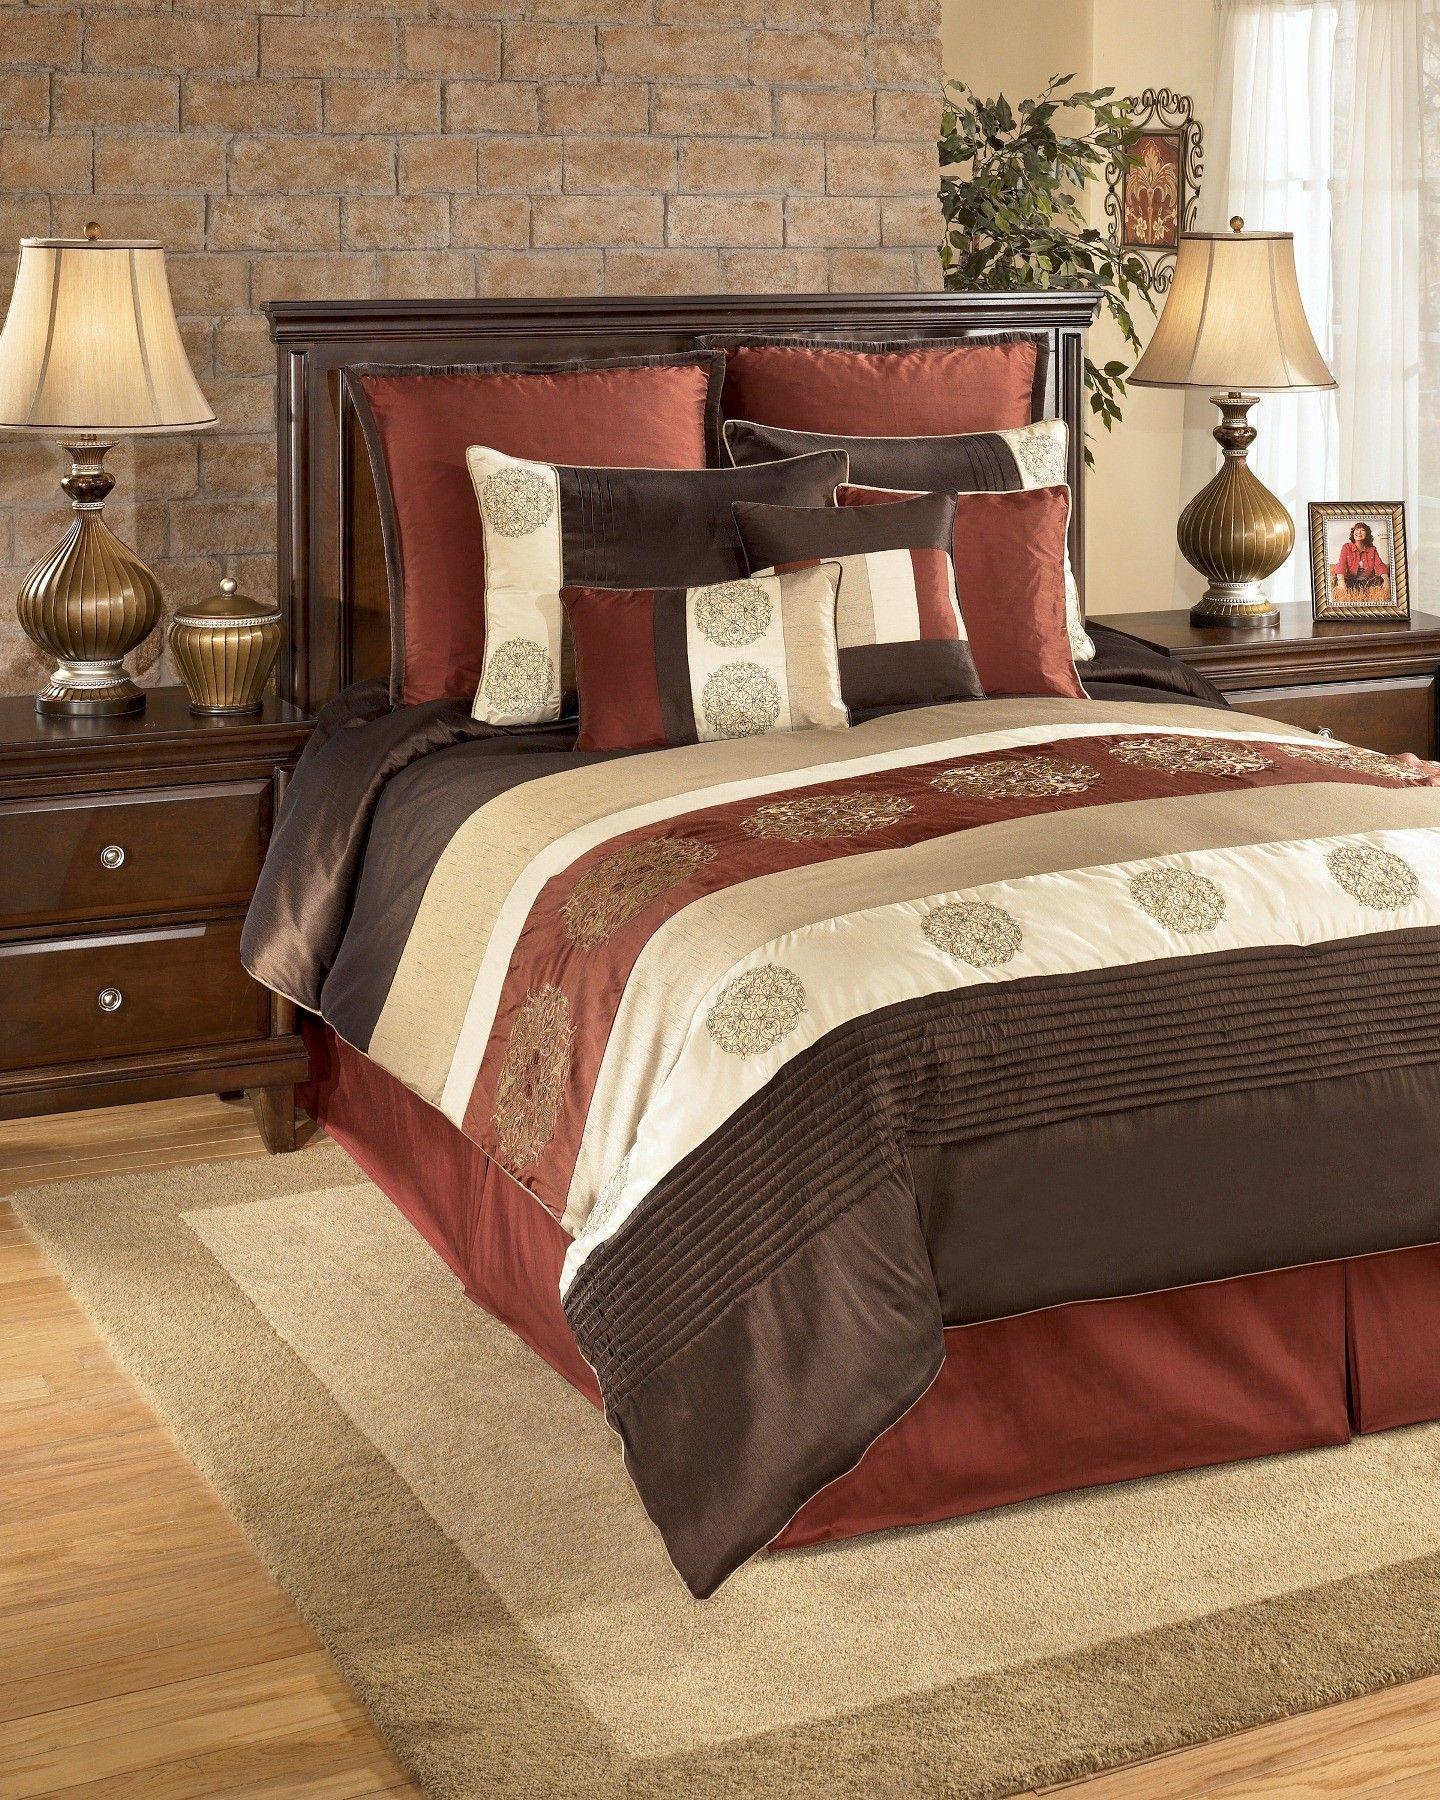 Oversized King Size Bedding 126x120  Milano Russett King Bedding Set,  Q175007k, Ashley Furniture